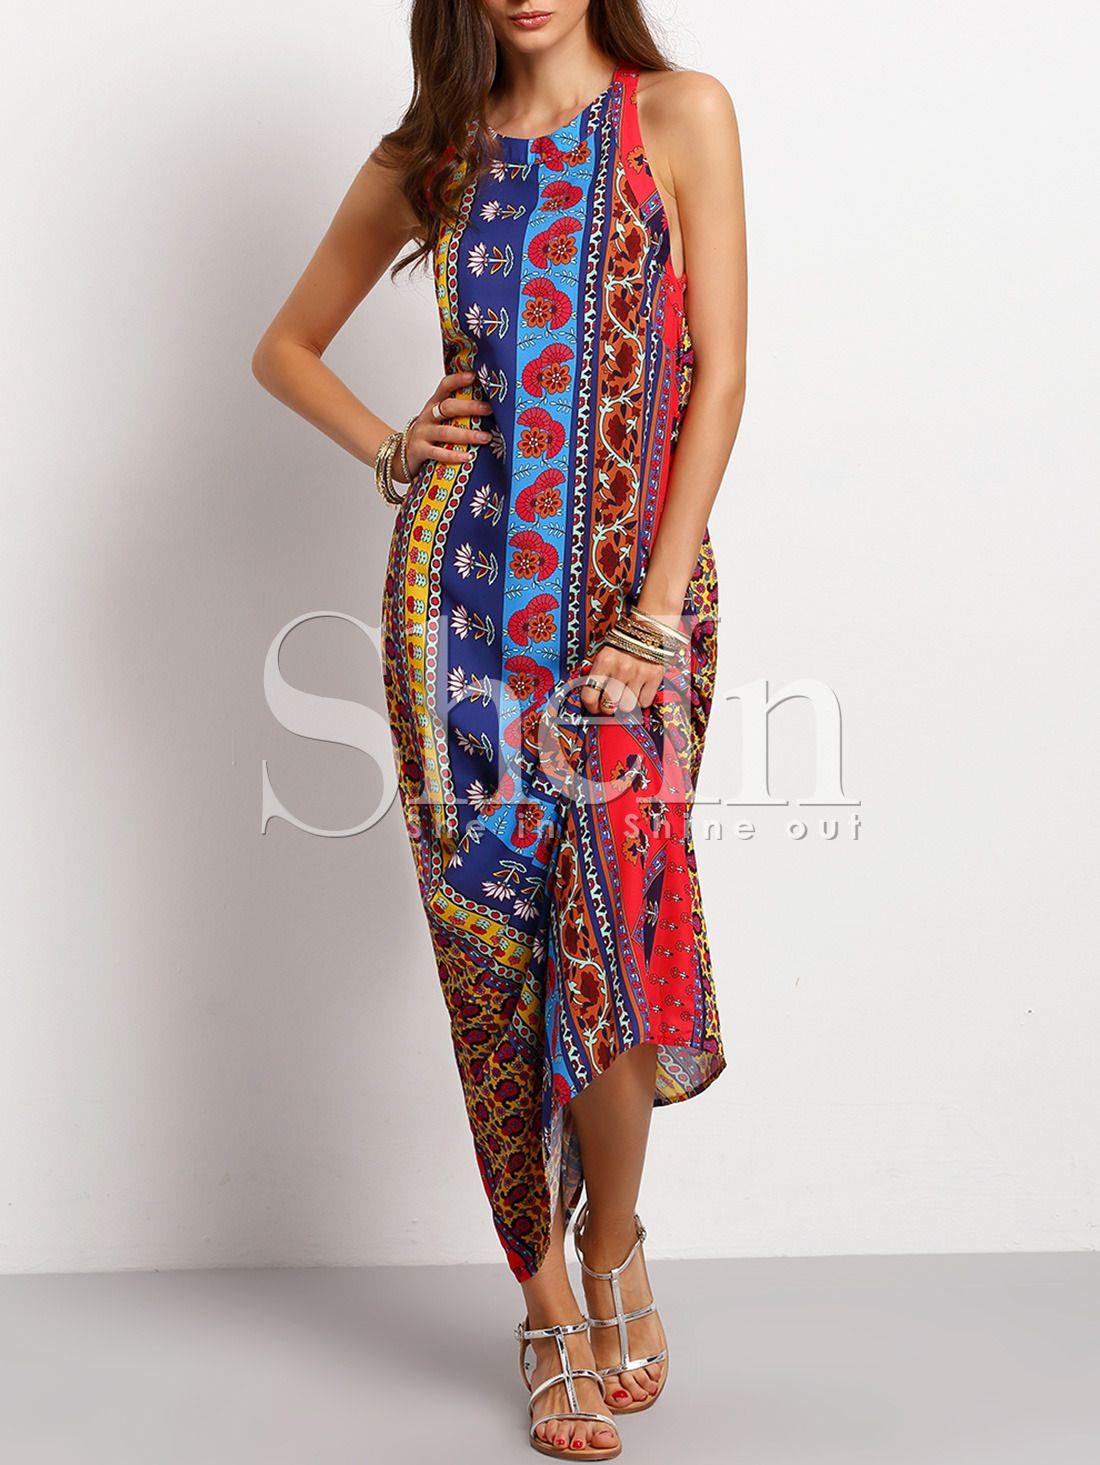 4744e077b4 Shop Multicolor Sleeveless Vintage Print Maxi Dress online. SheIn ...